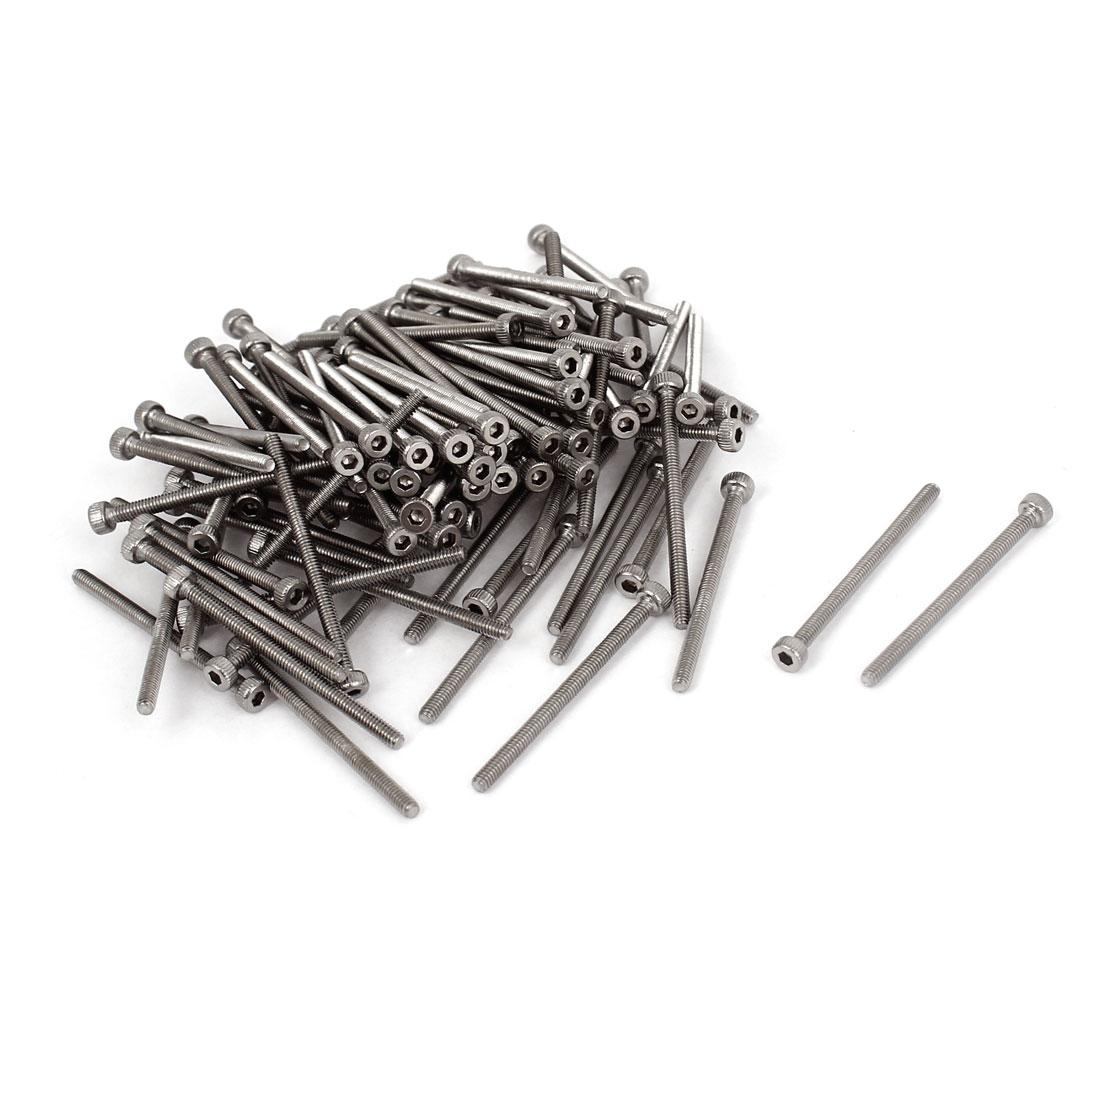 100 Pcs M2x30mm Stainless Steel Hex Key Socket Head Cap Machine Screws 32mm Long